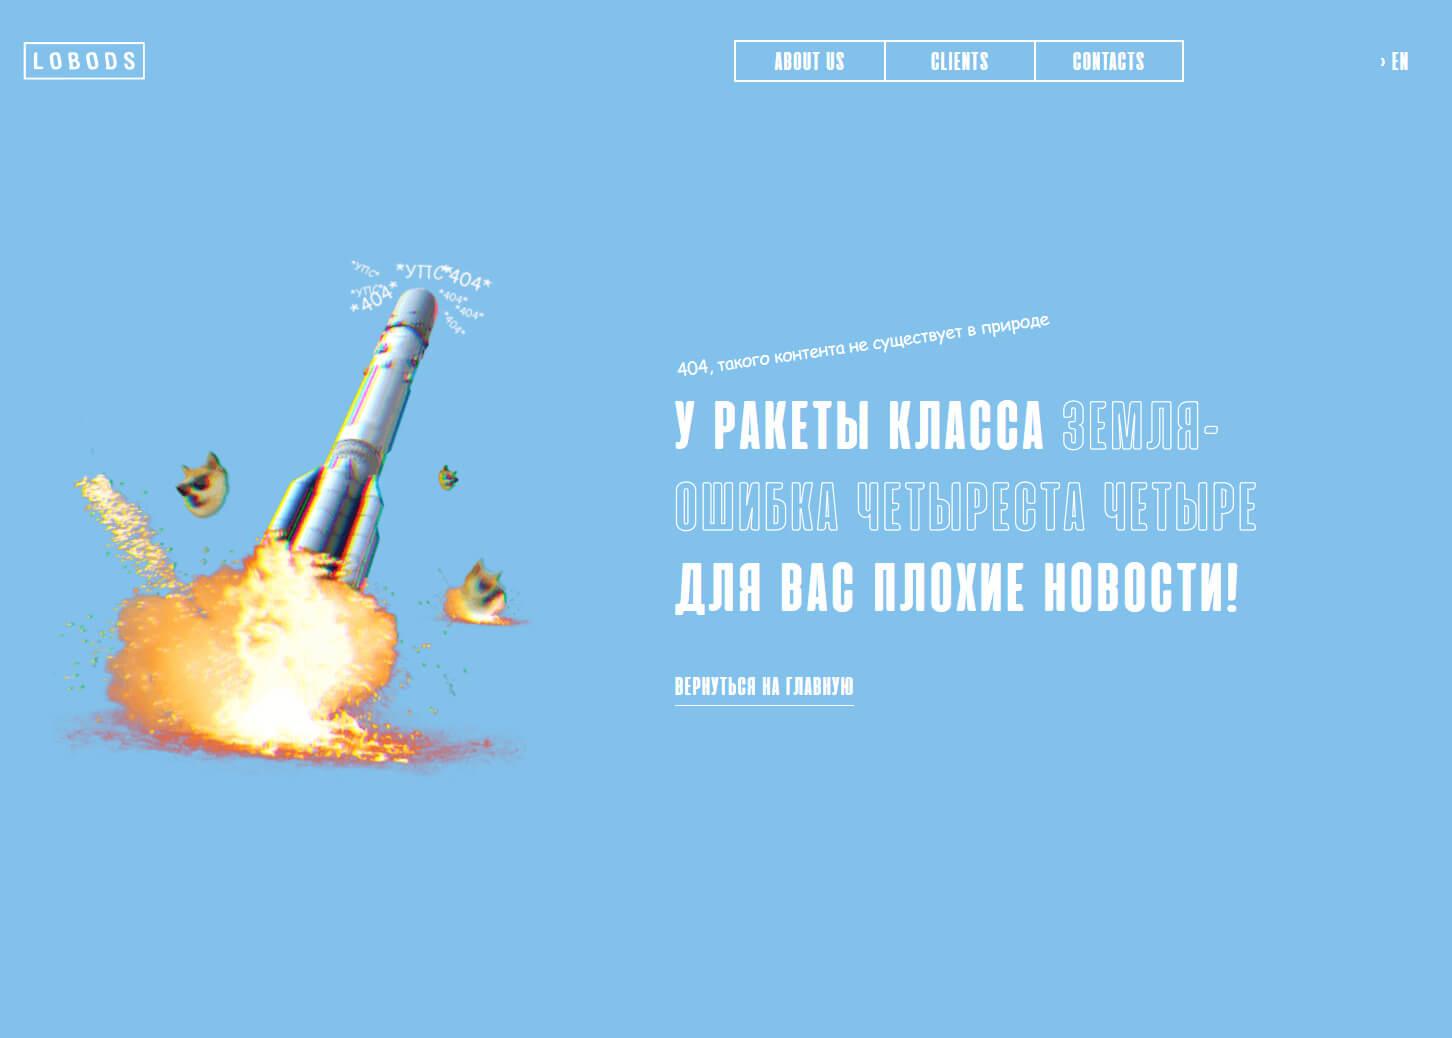 Lobods 404 error page